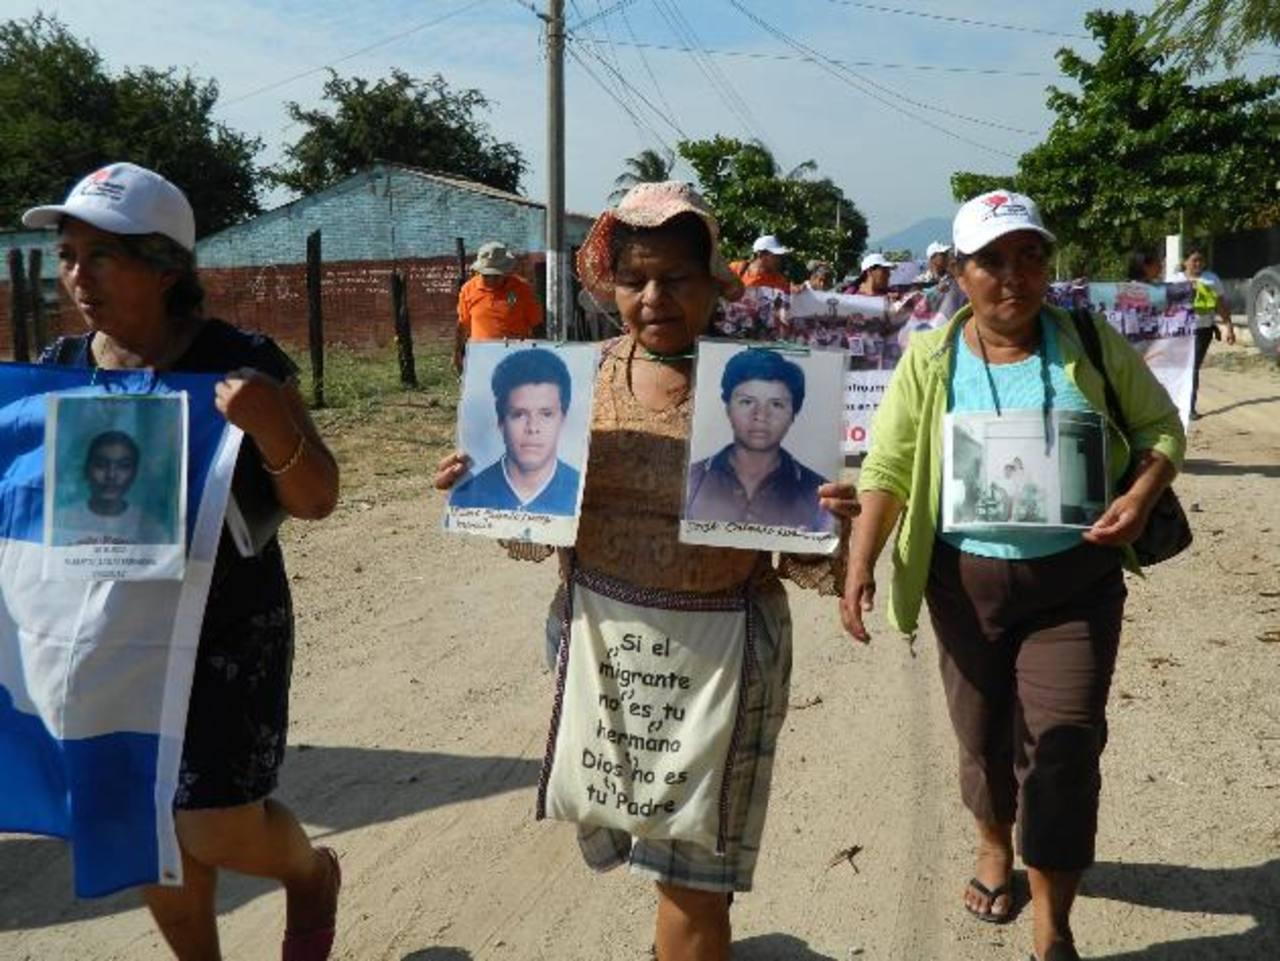 Madres centroamericanas buscarán a sus hijos desaparecidos en México